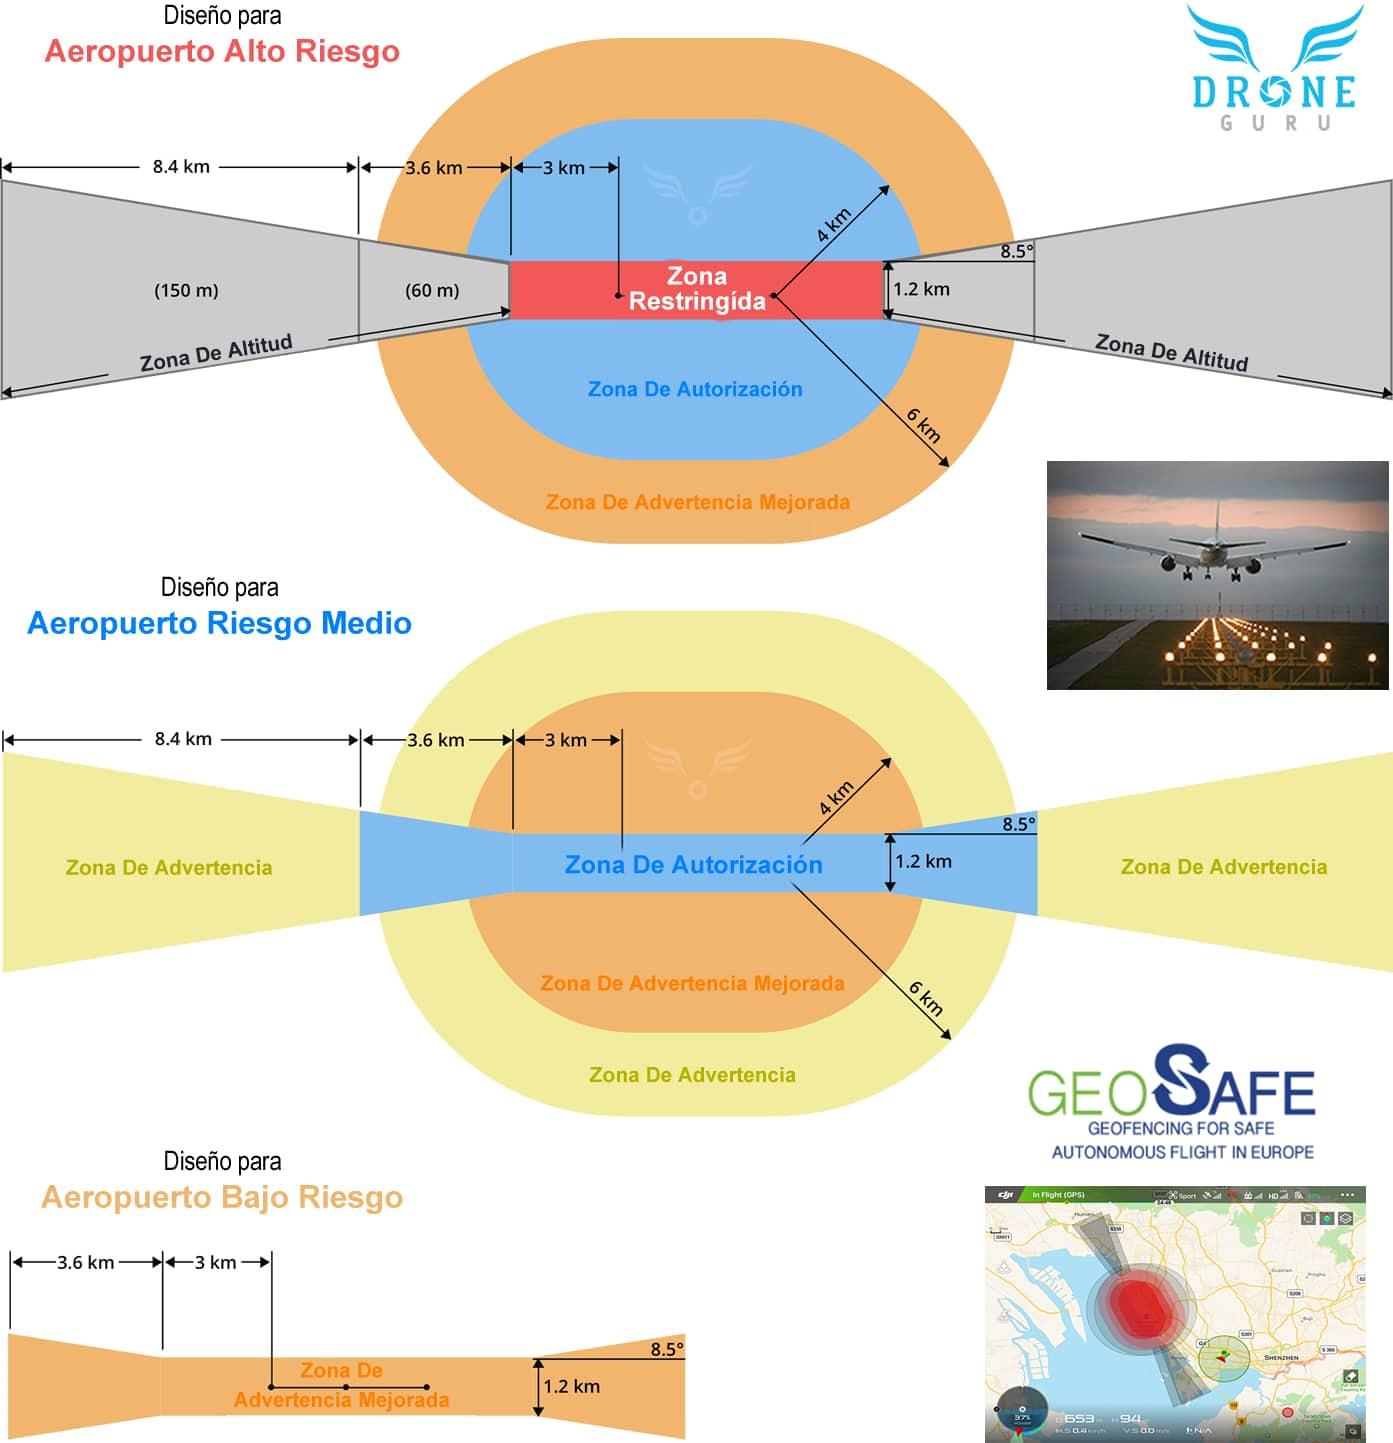 Drone GURU - Diseño pistas GEO/NFZ